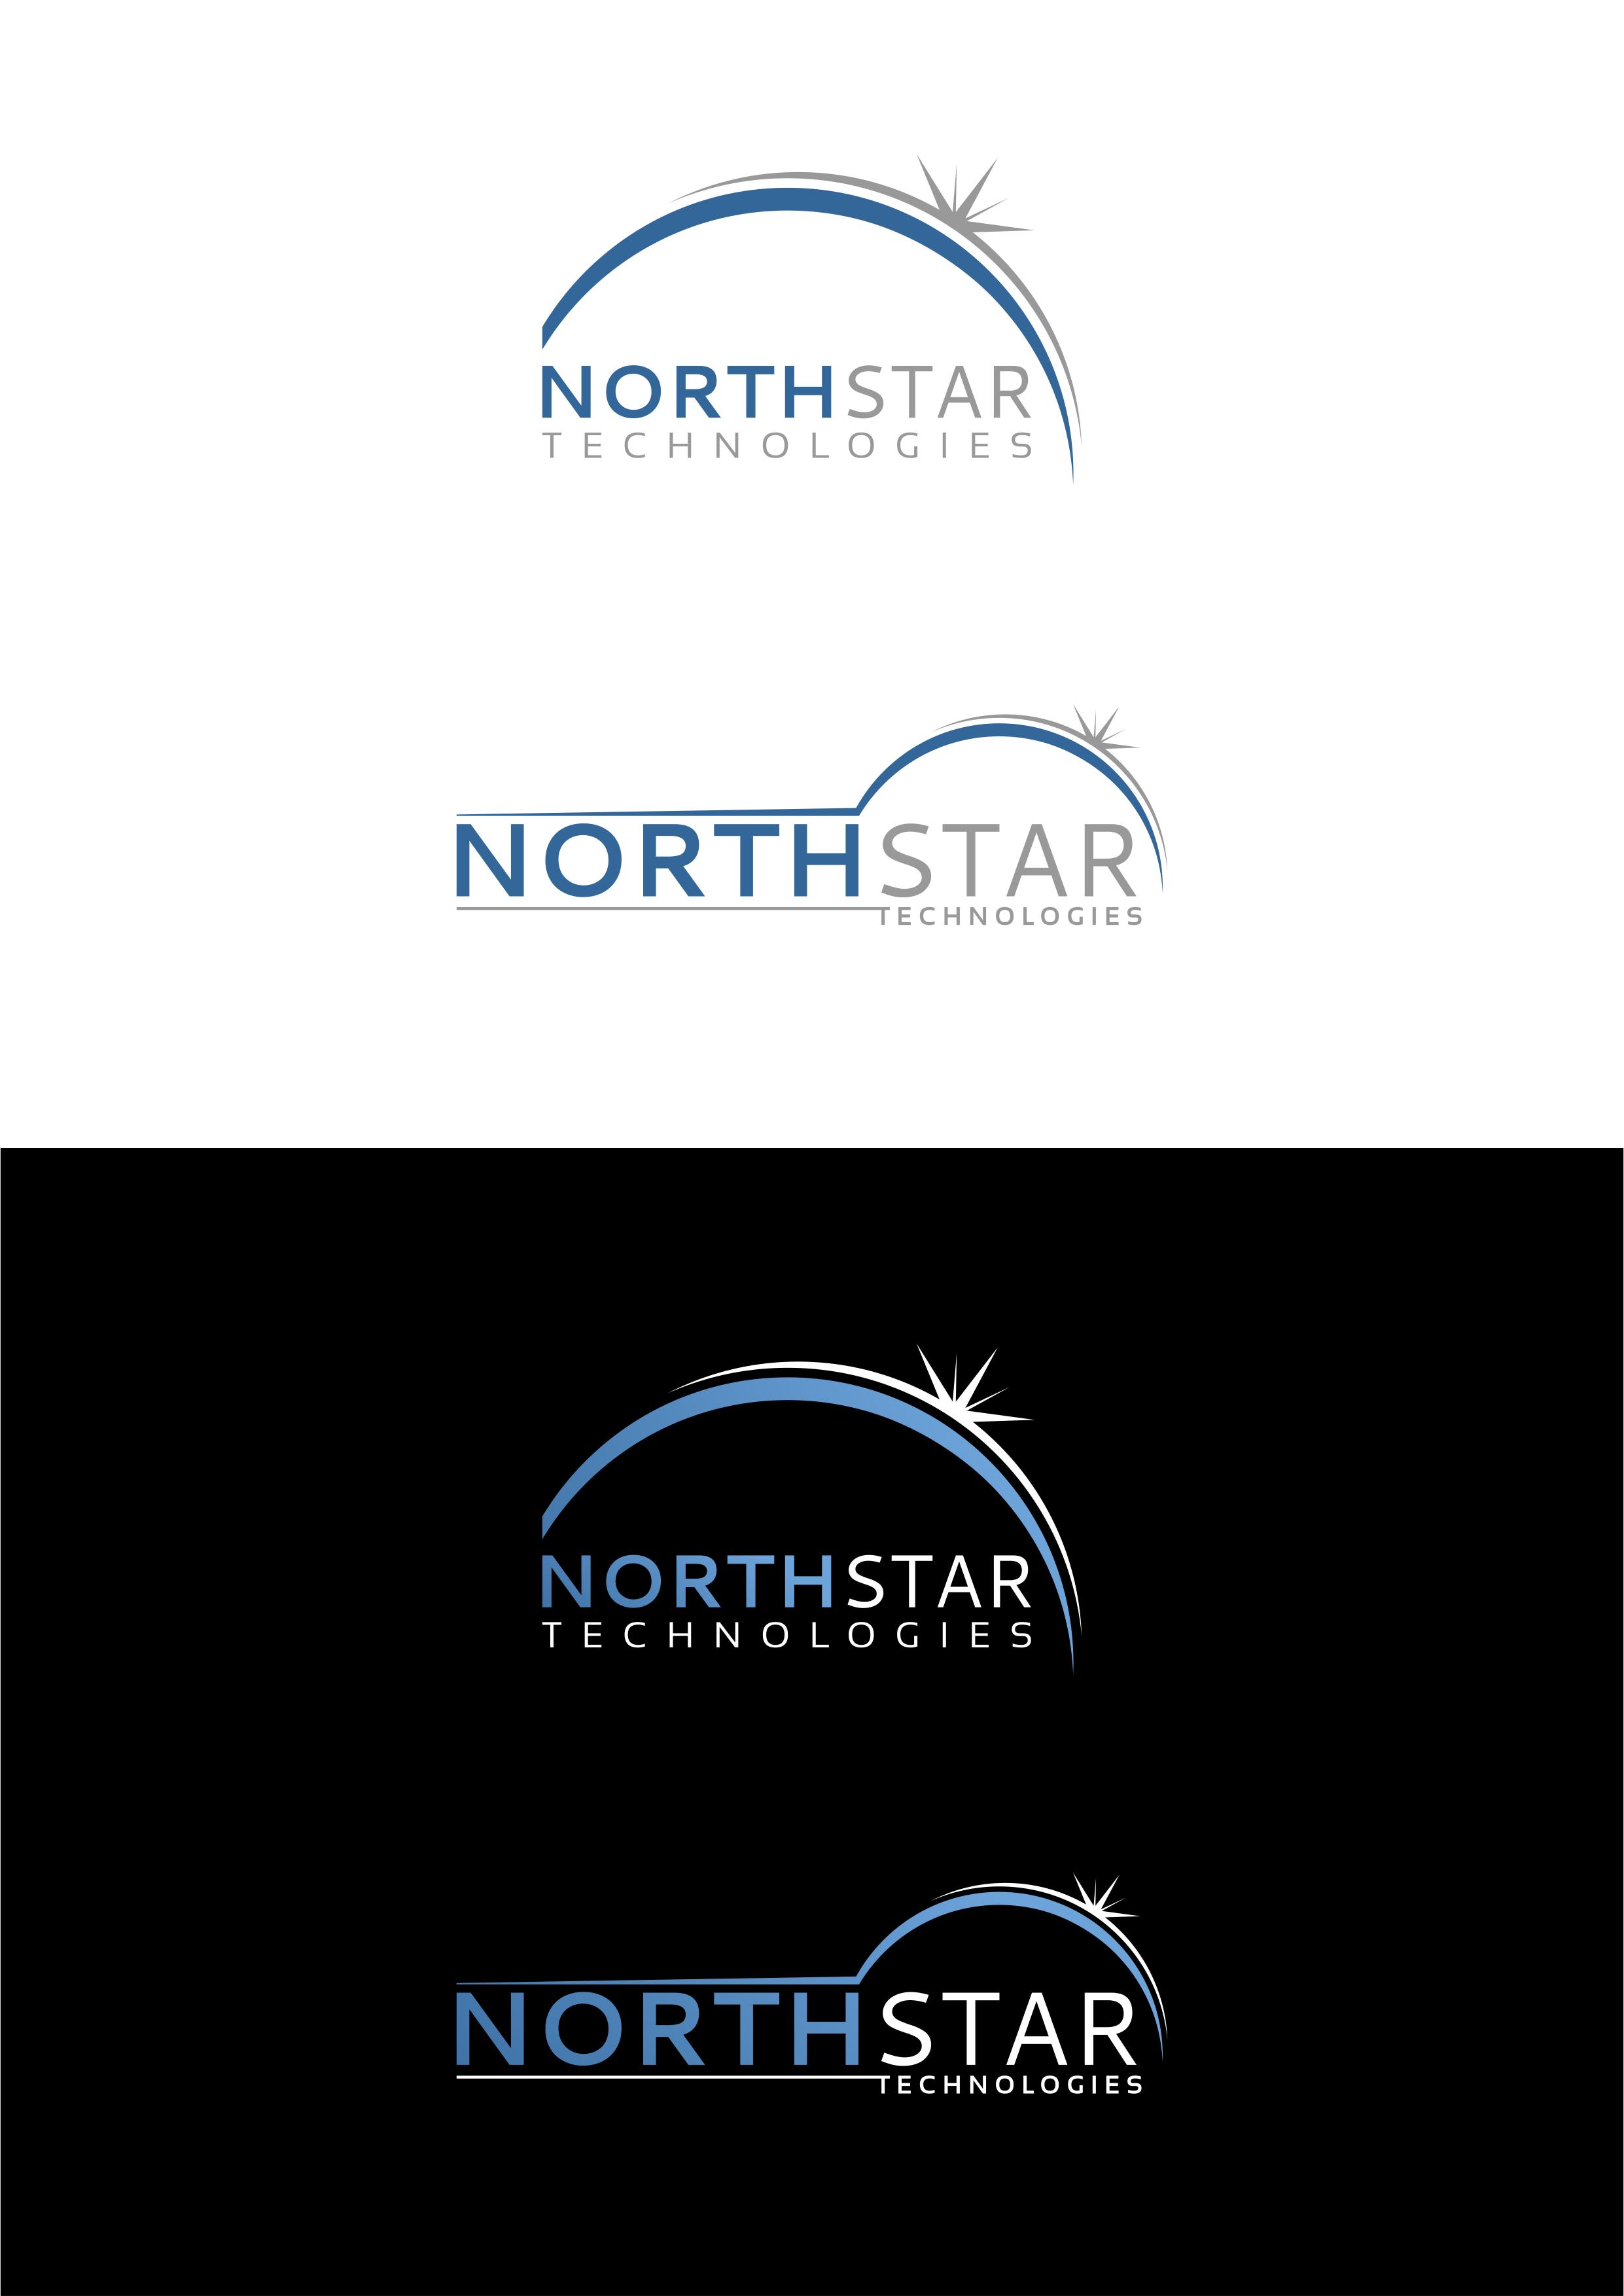 Create a logo for a Drone company